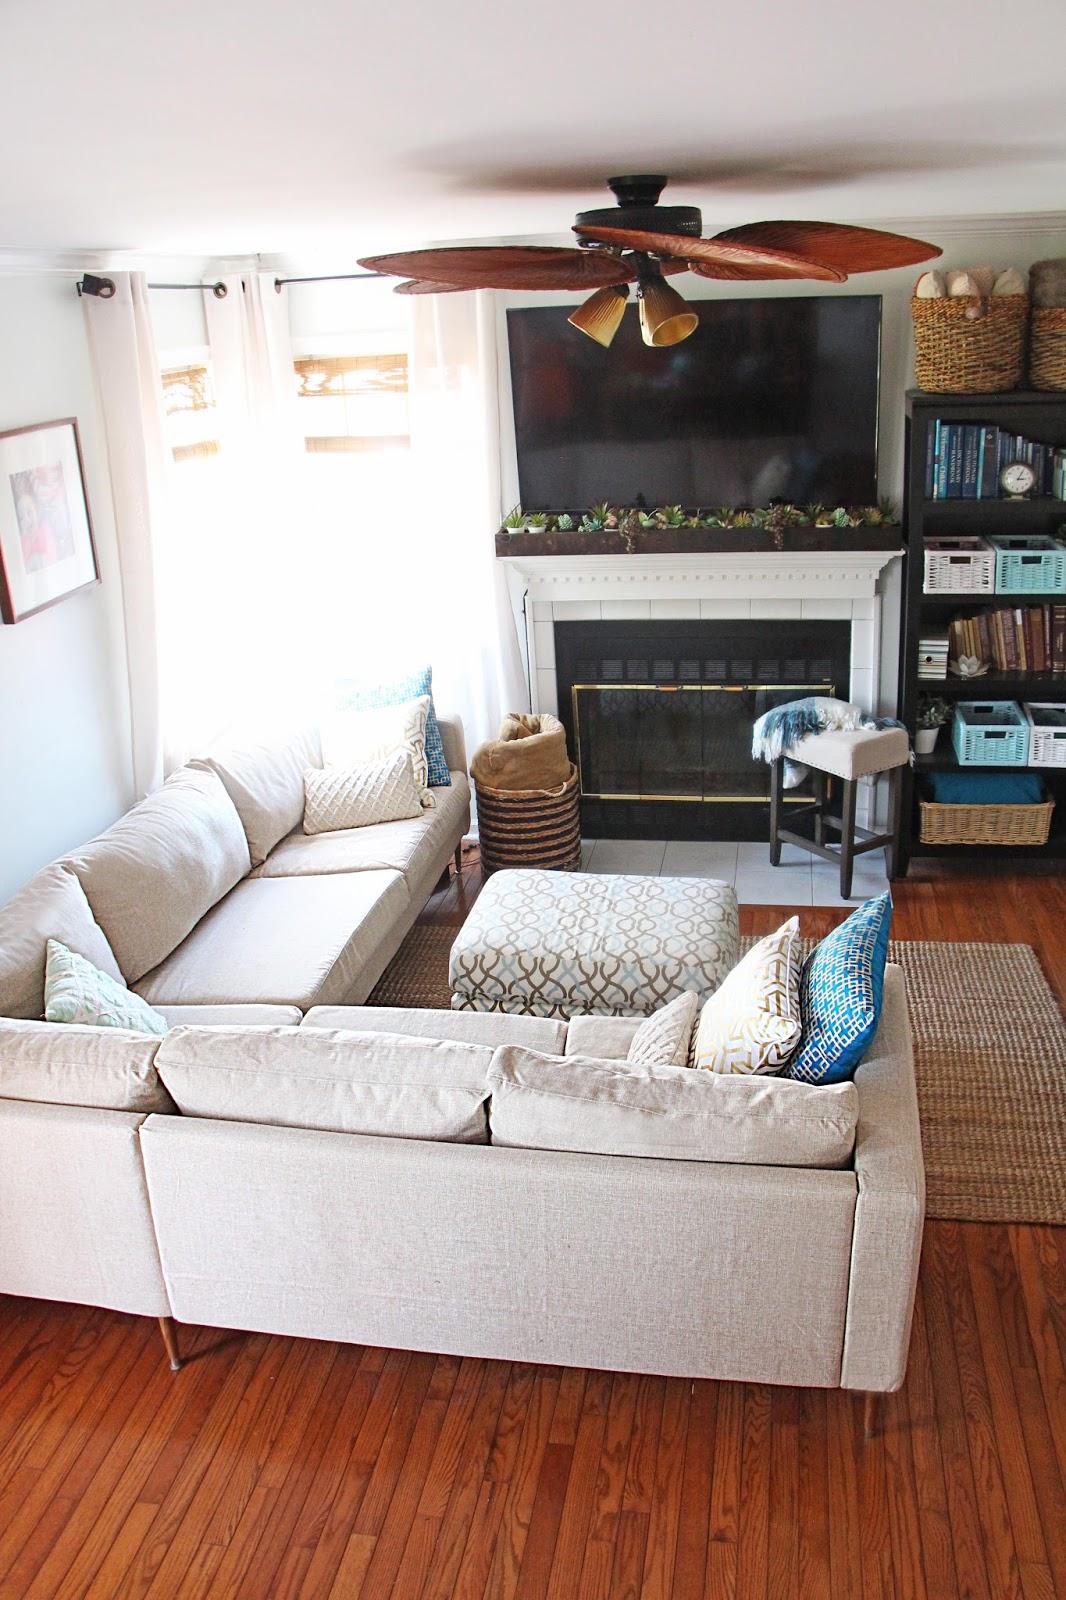 ekeskog sofa slipcover modern tufted bonded leather sleeper futon with nailhead white grosgrain finally affordable ikea slipcovers